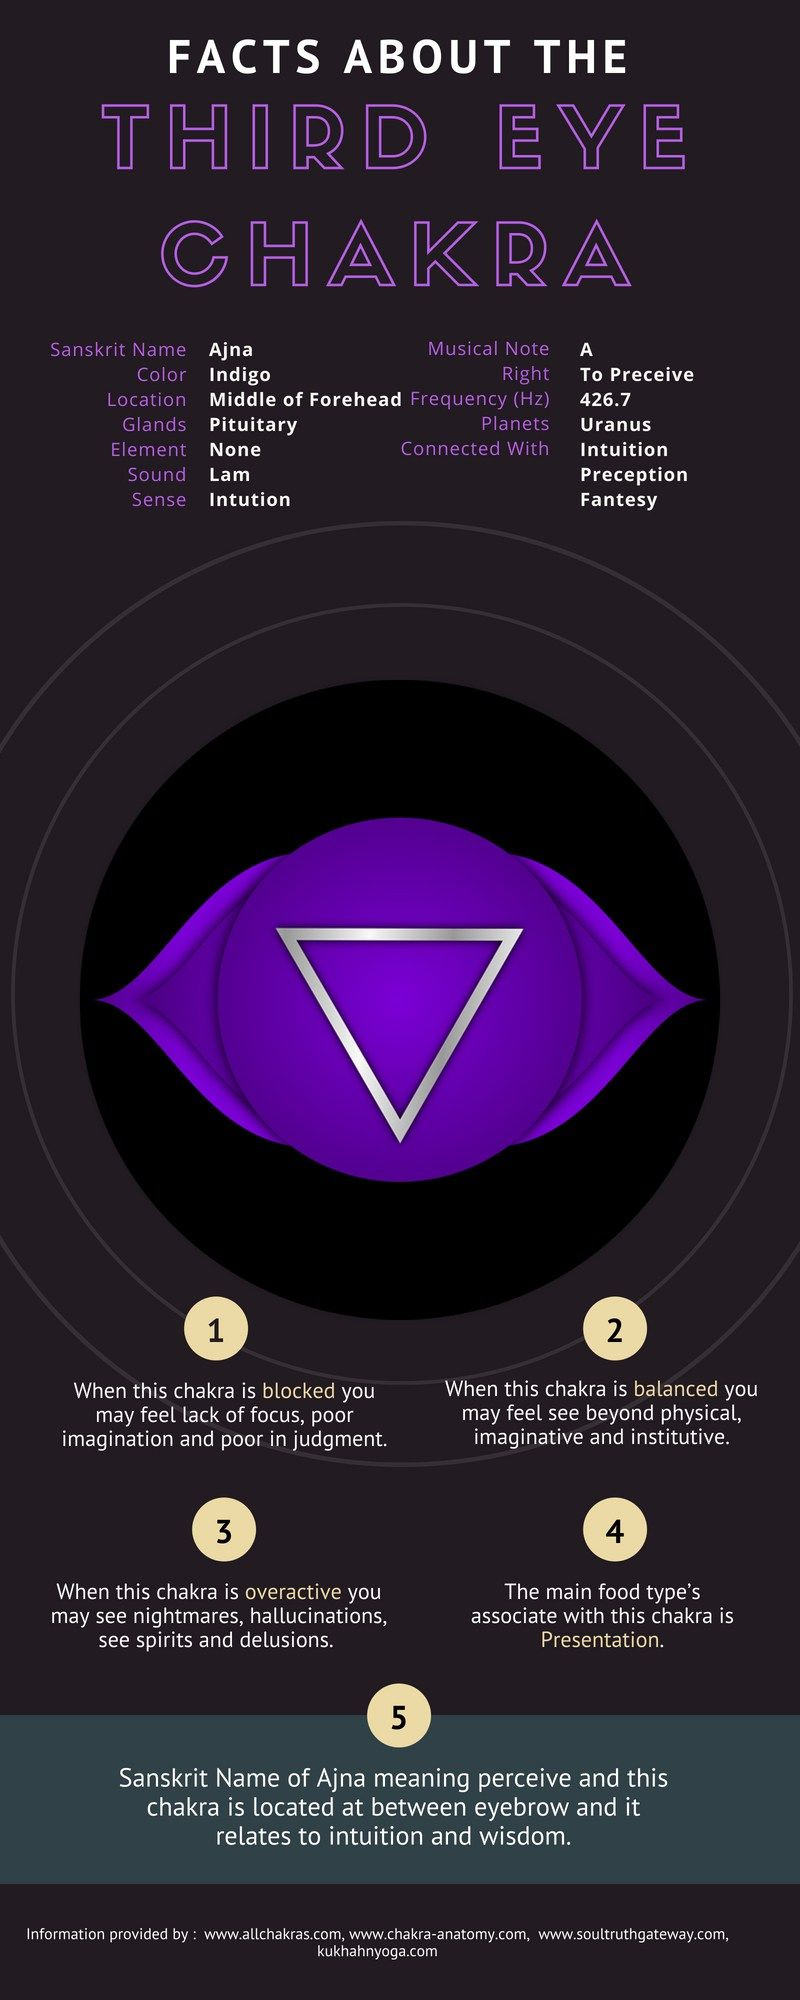 e8fdb007d5e07c55d6ba7cc7dc4f8dba pin by bri bri on meditation pinterest chakra, third eye chakra